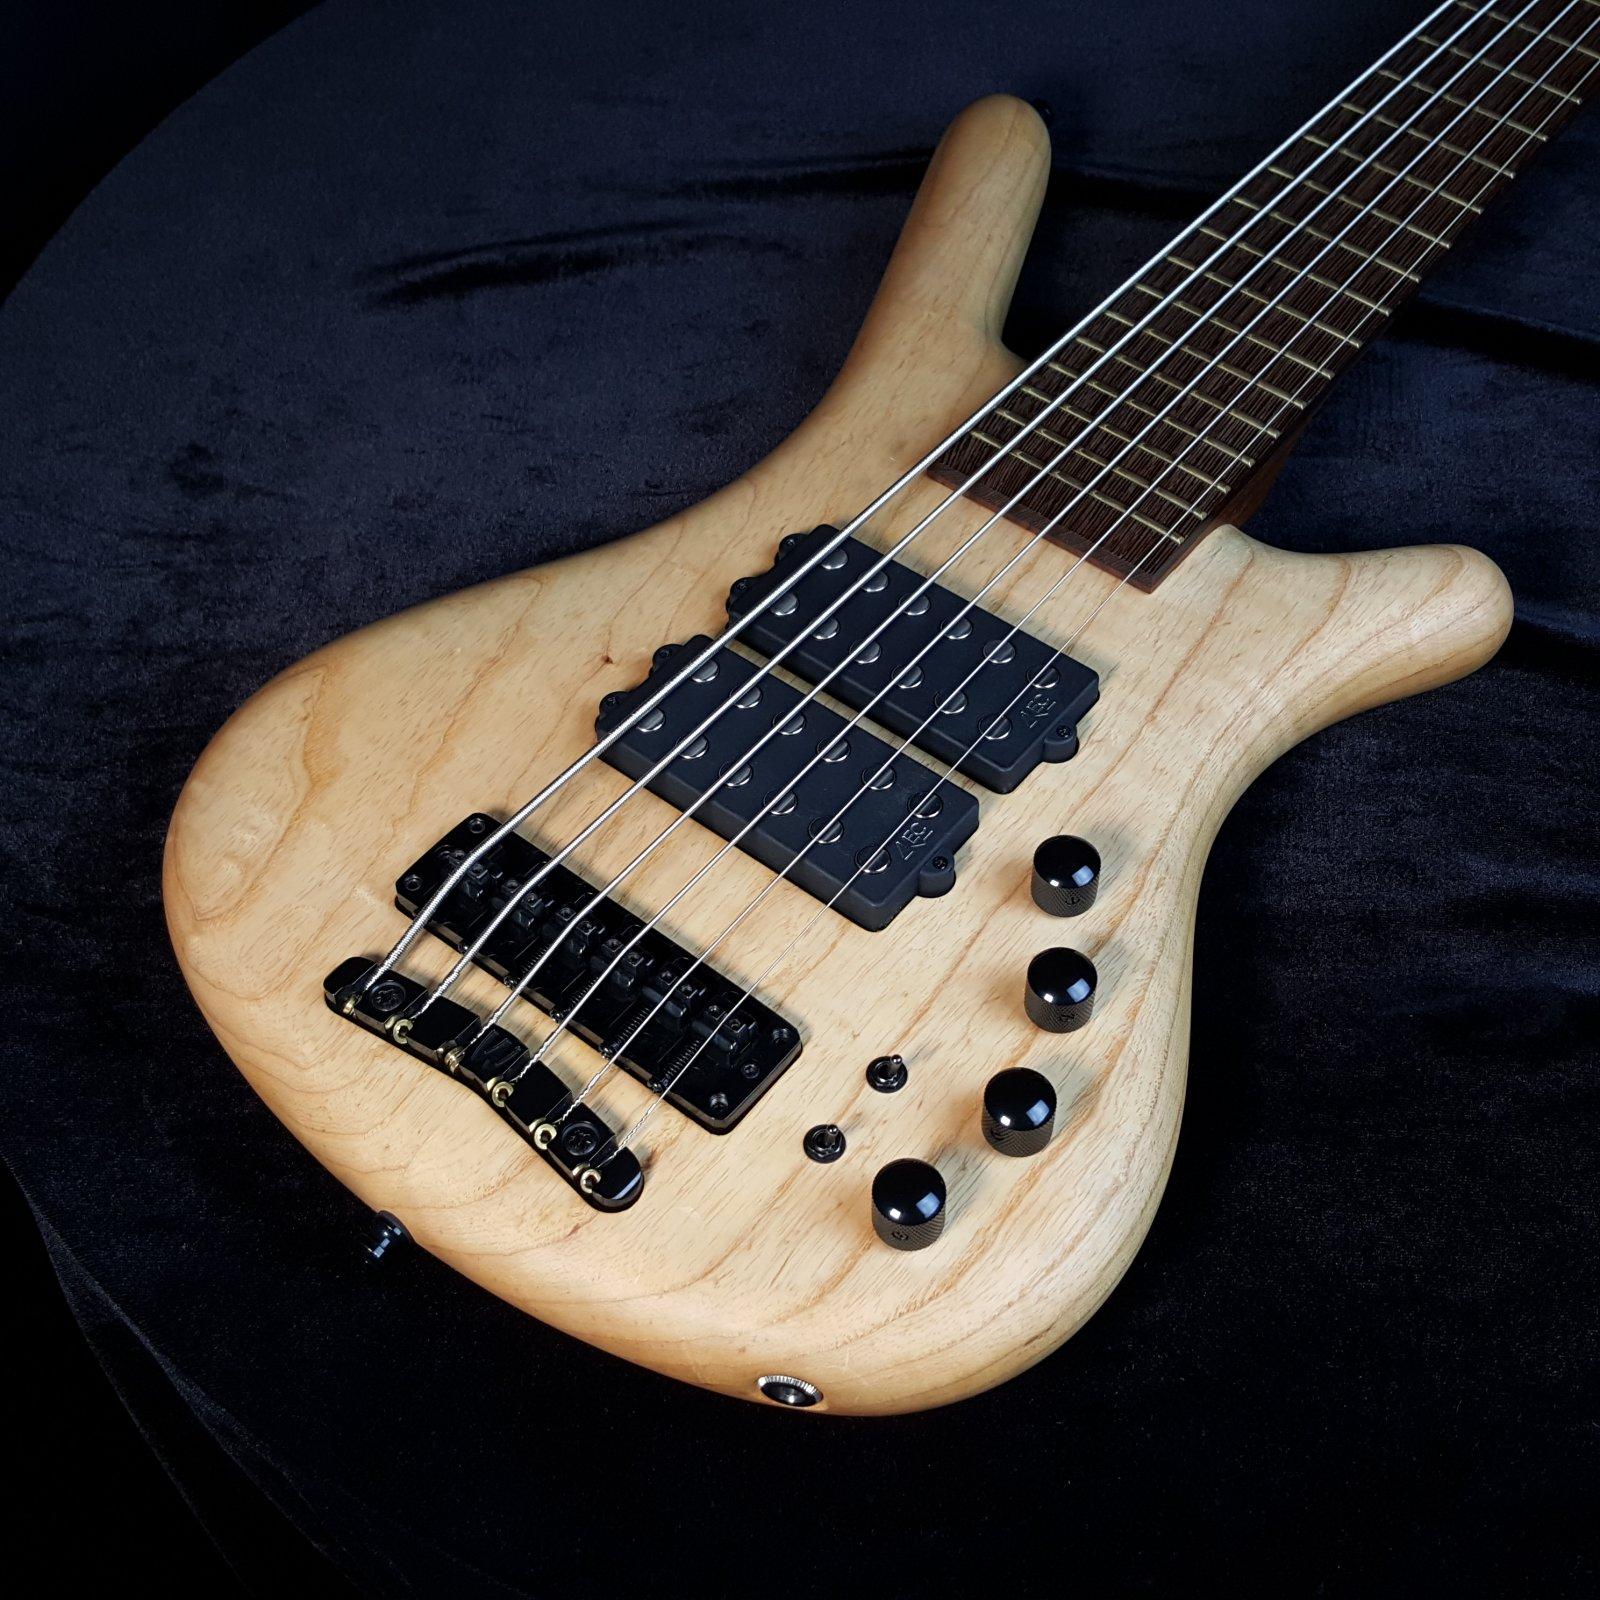 USED Warwick Corvette $$ 6-String Bass w/ Gig Bag